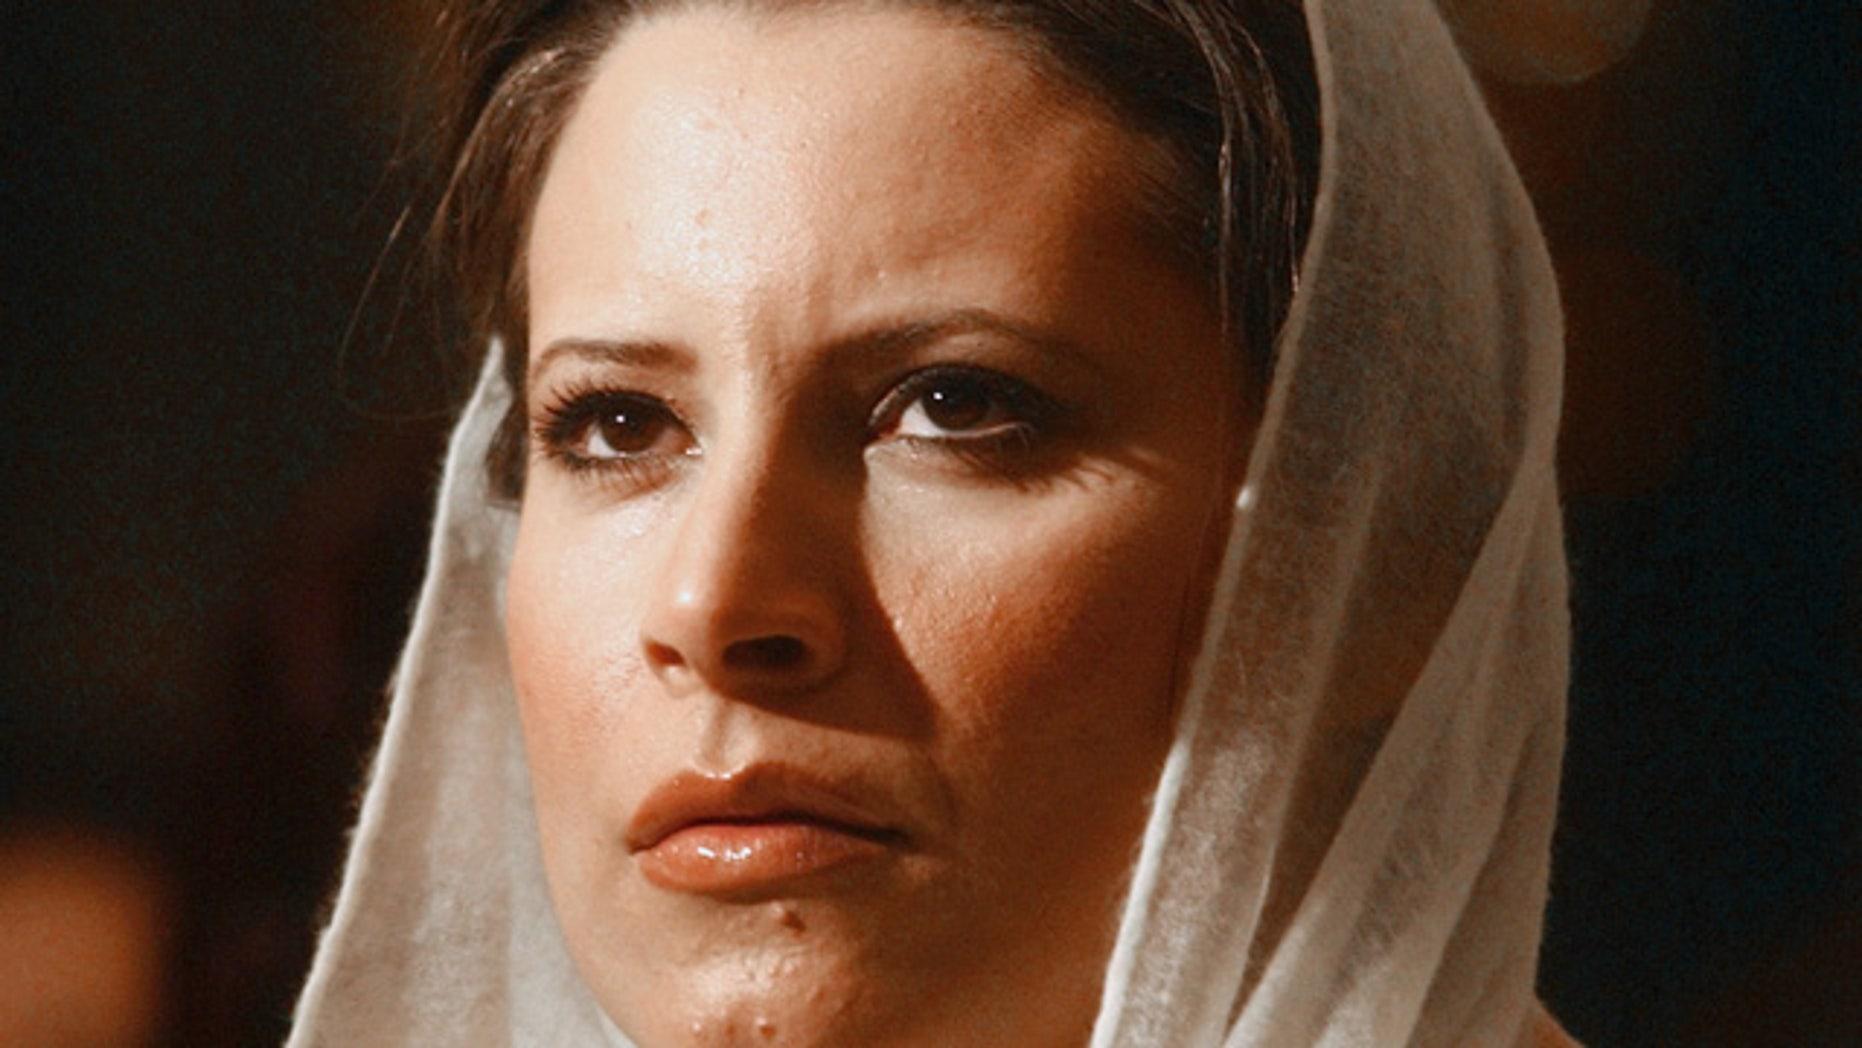 FILE 2005: Aisha Qaddafi, the daughter of Libyan leader Moammar Qaddafi, looks on before making a speech on the achievement of Libyan women in Cairo.